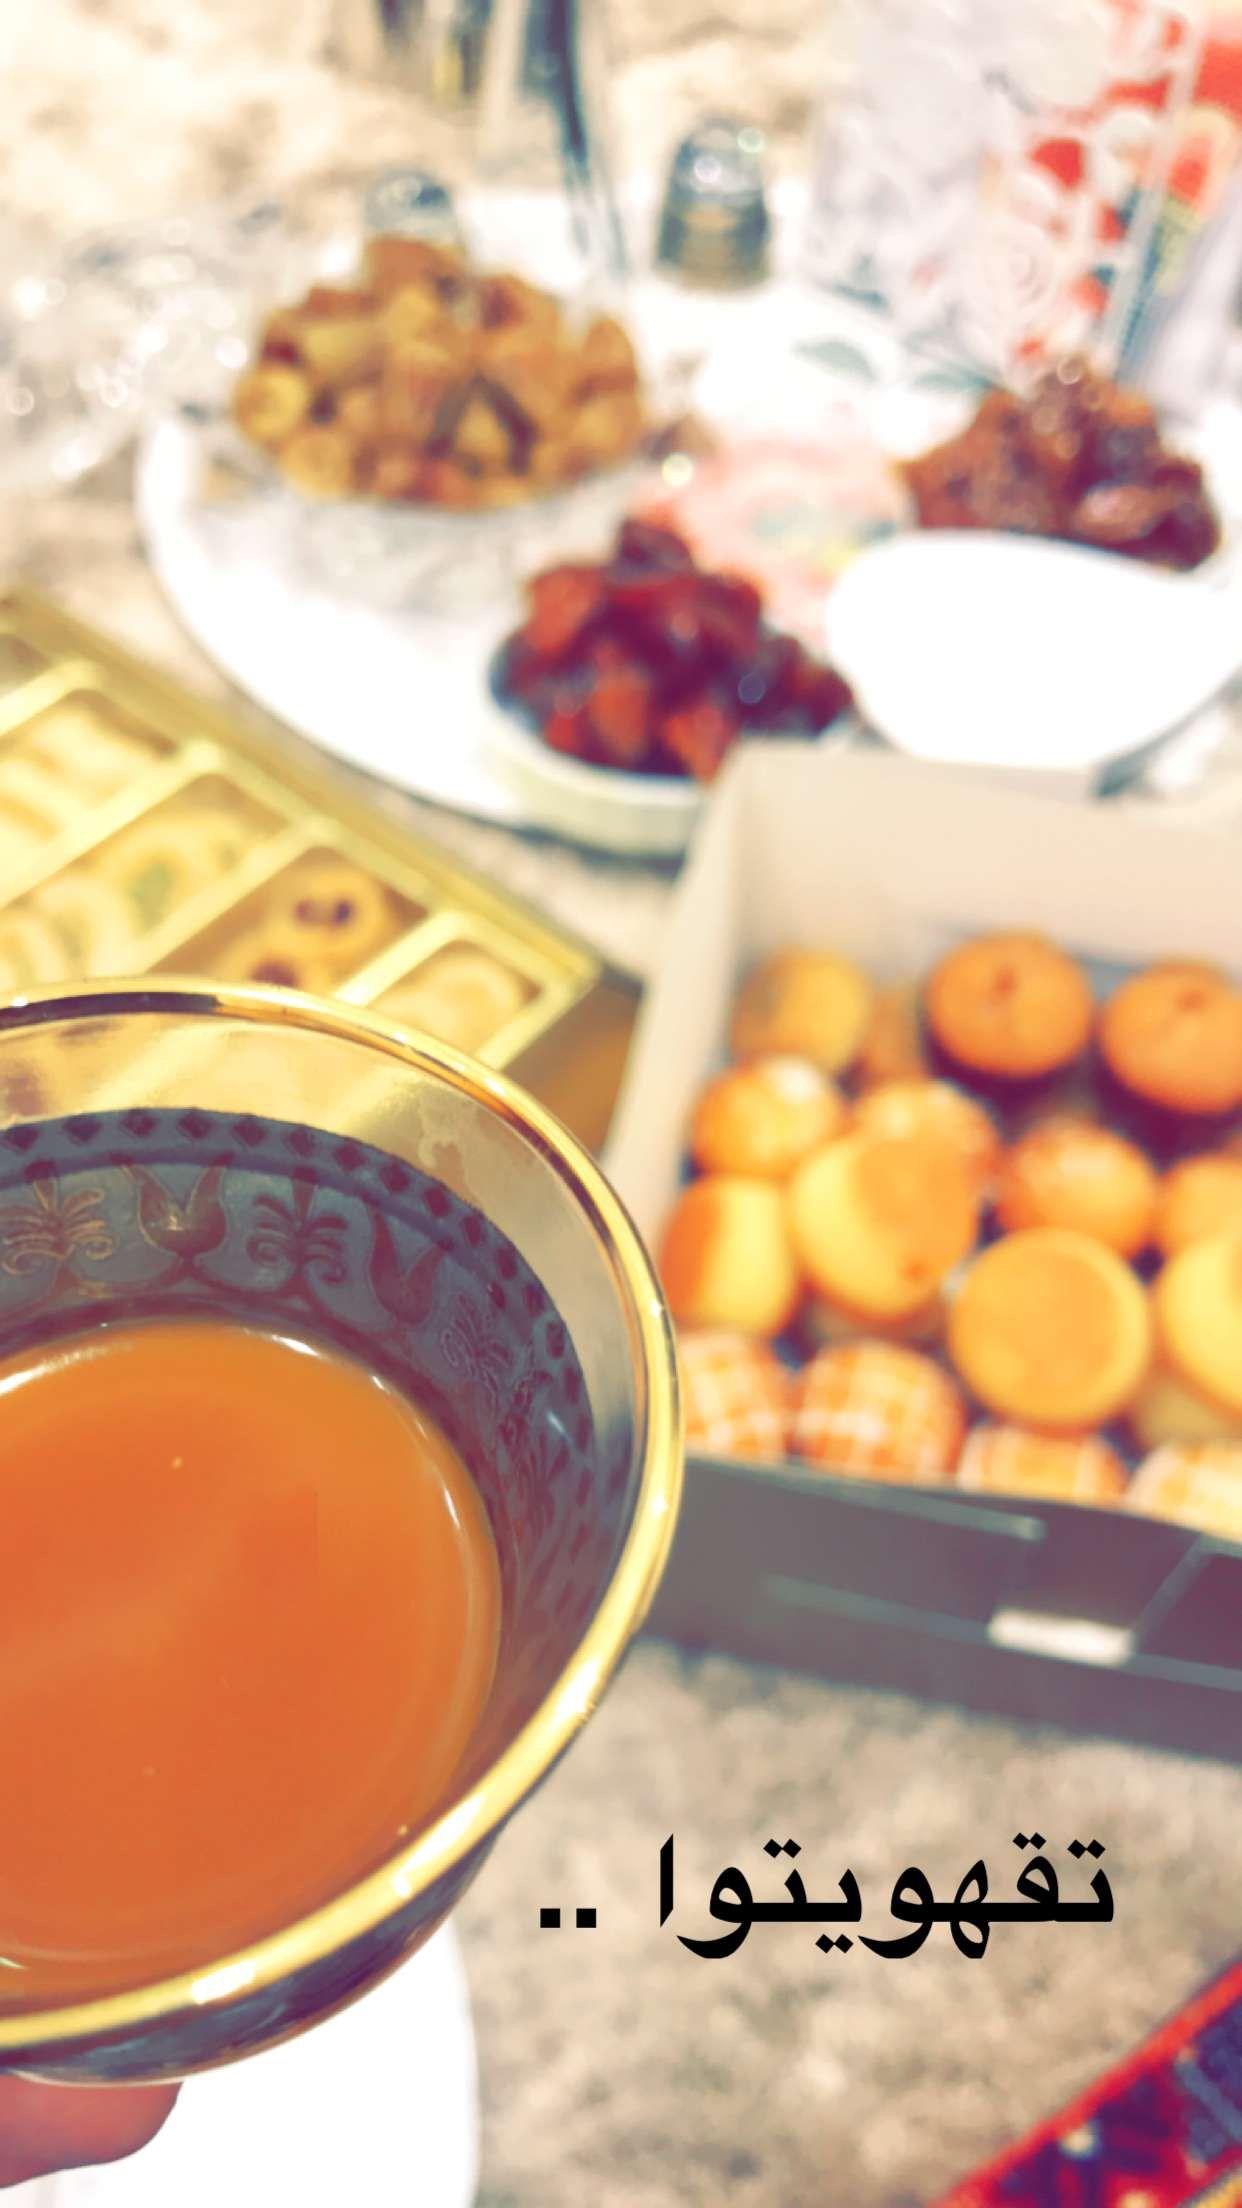 Pin By Shahad On سناب موضي البليهد Food Snapchat Snap Food Food And Drink